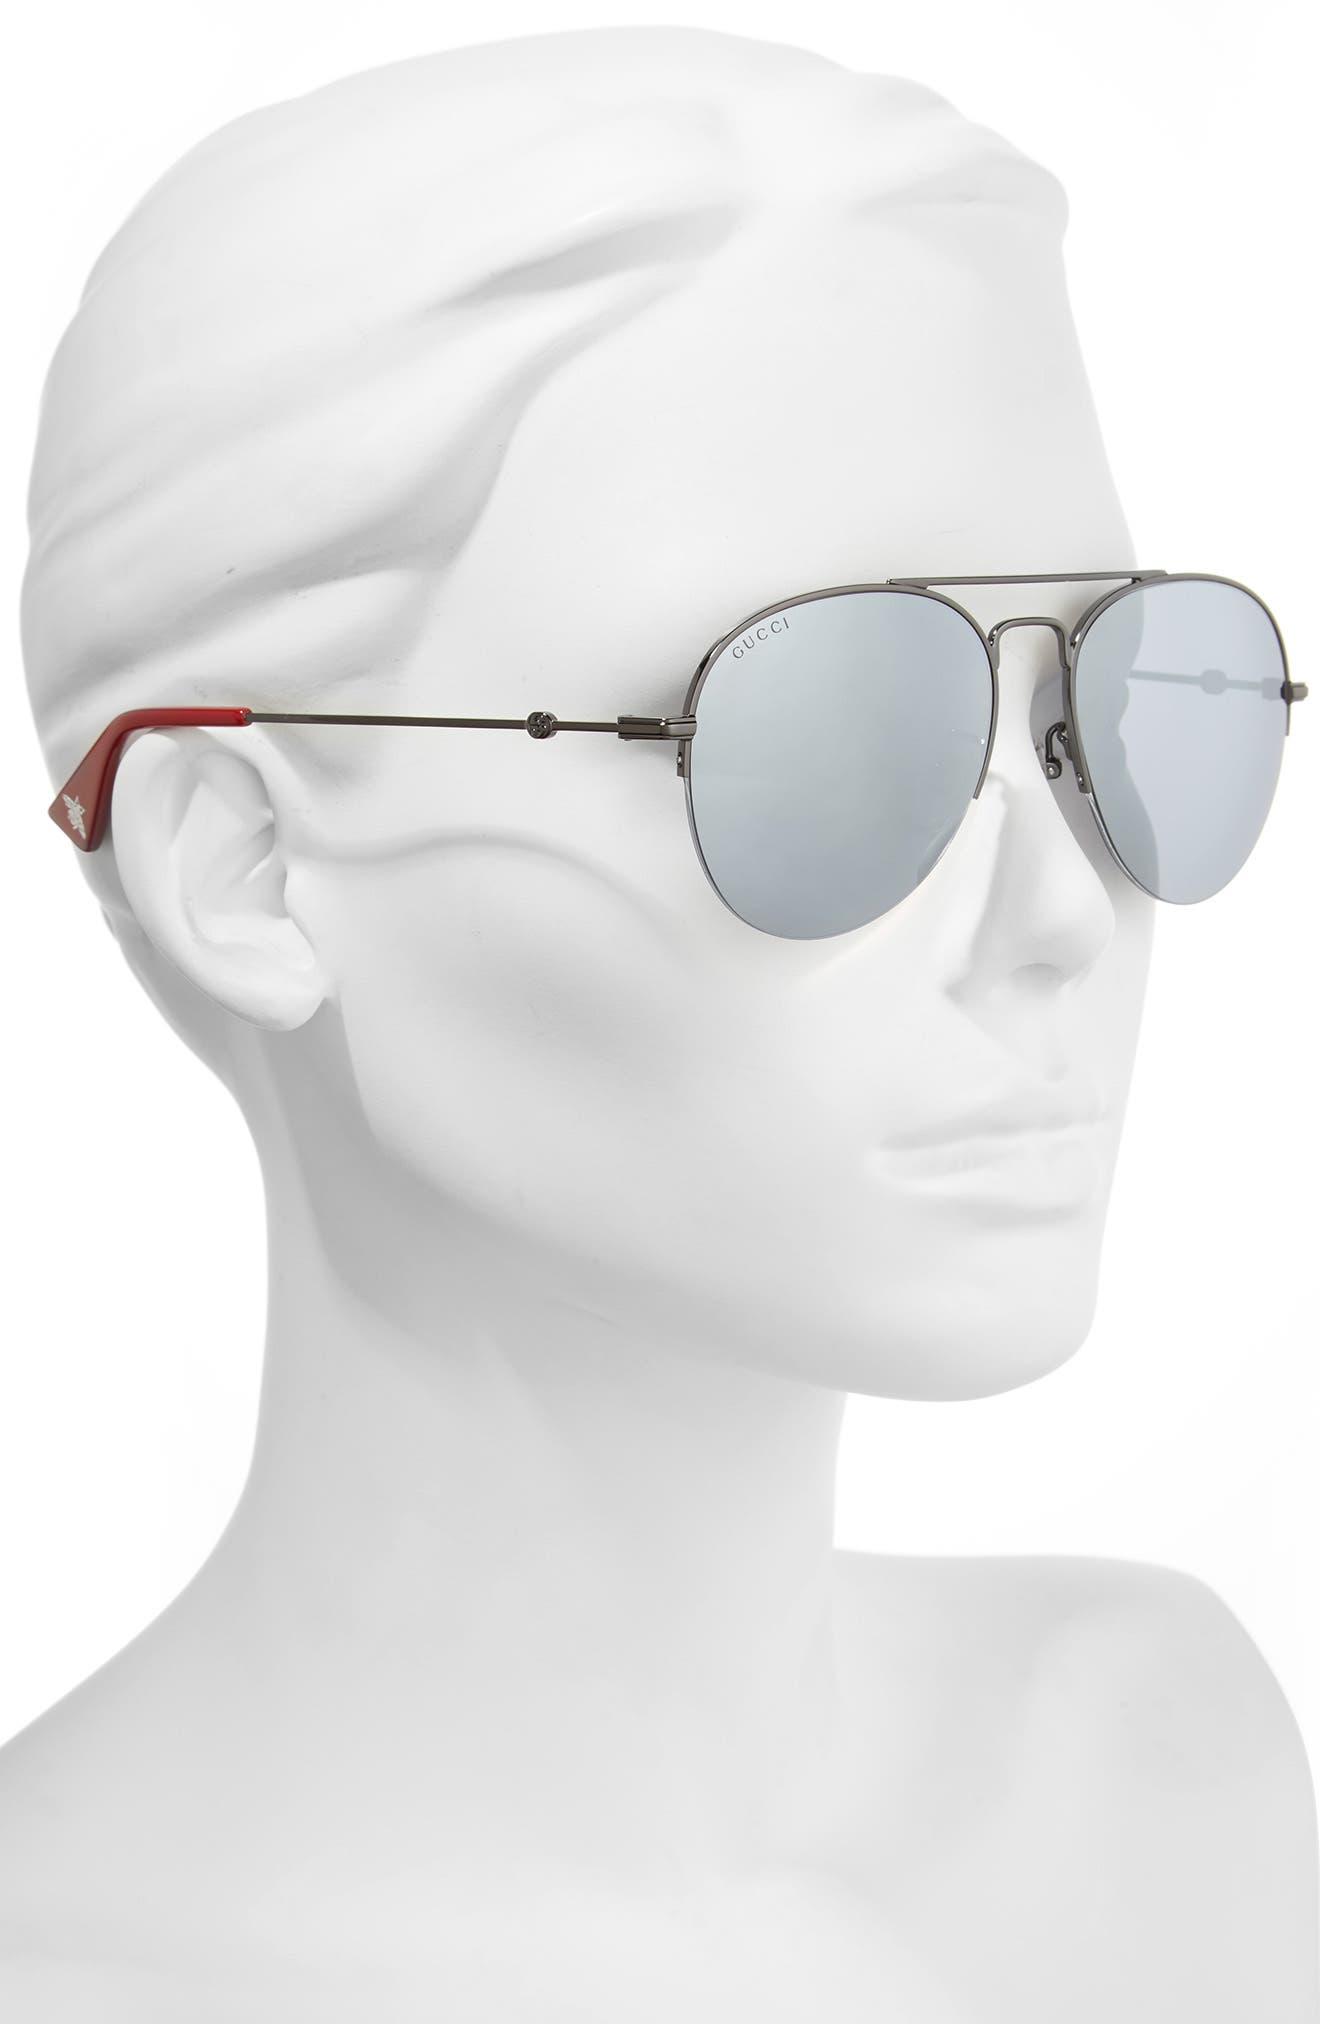 56mm Aviator Sunglasses,                             Alternate thumbnail 2, color,                             040